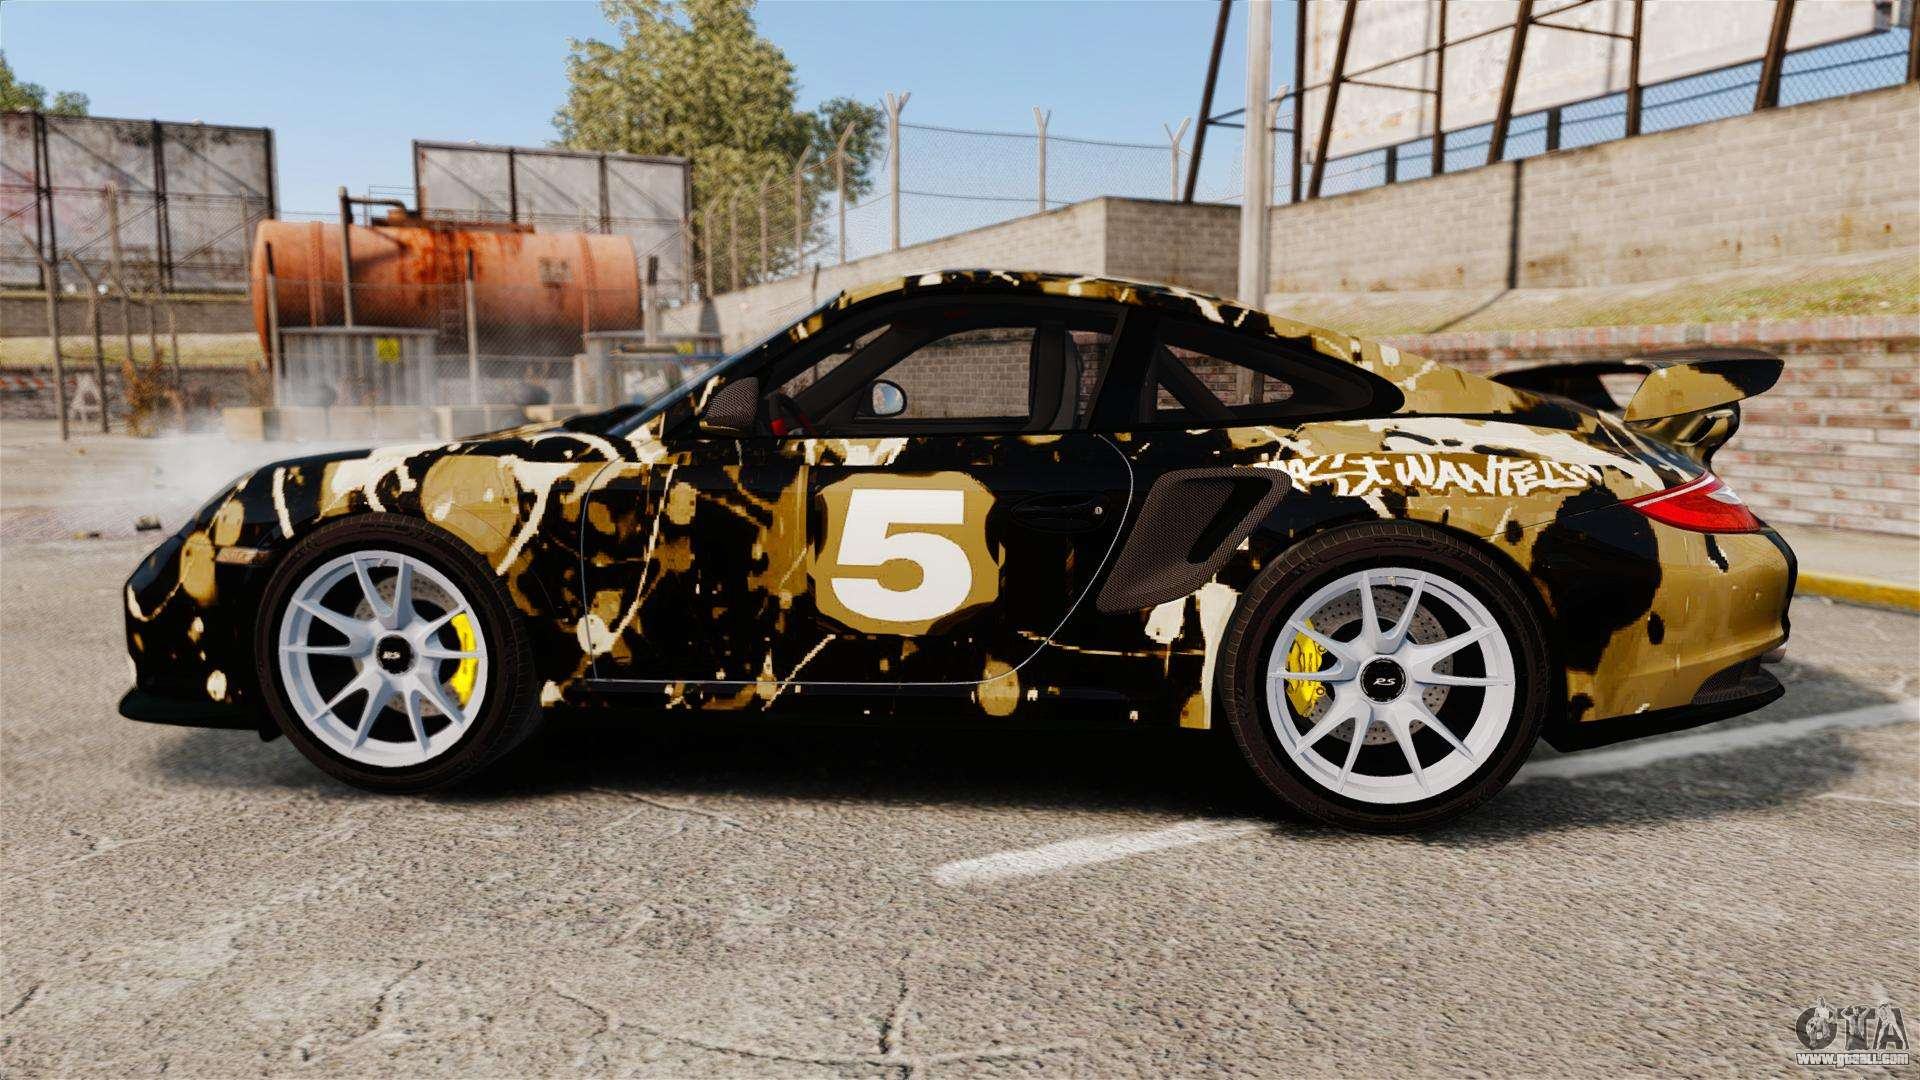 178608-GTAIV-2014-04-16-15-07-29-41 Remarkable Porsche 911 Gt2 Xbox 360 Cars Trend